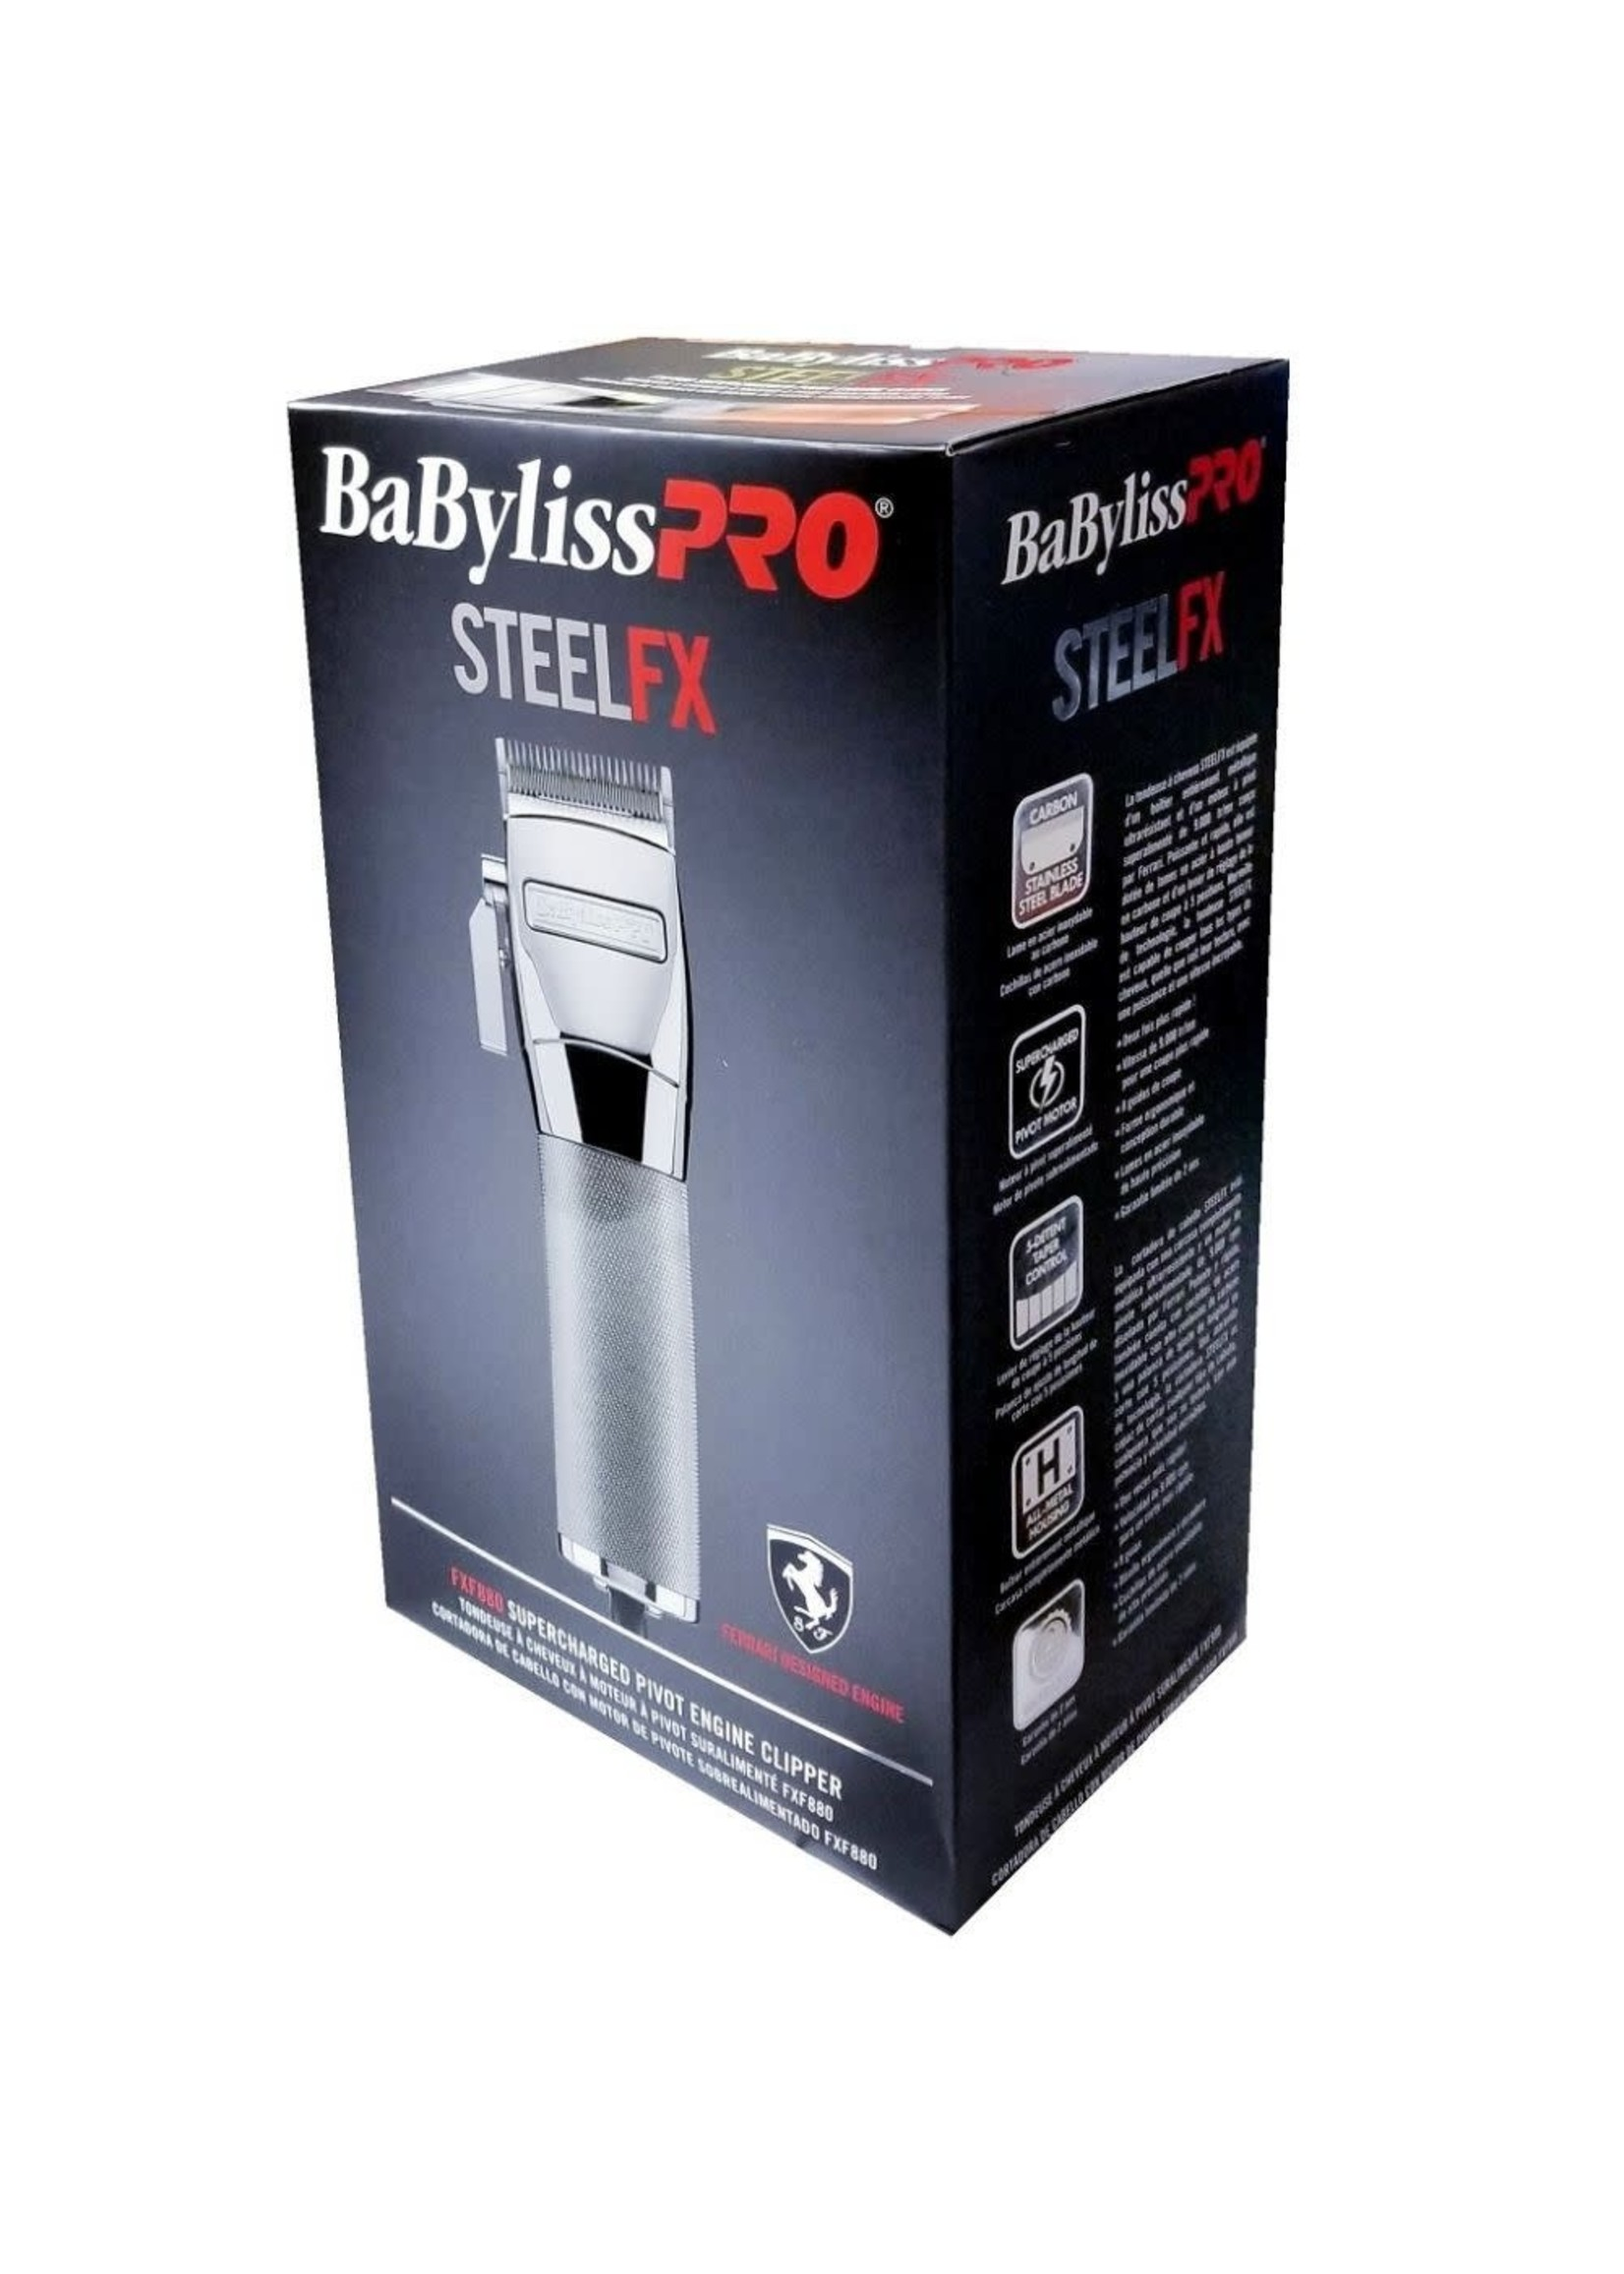 Babyliss BabylissPro Steel FX Pivot Clipper